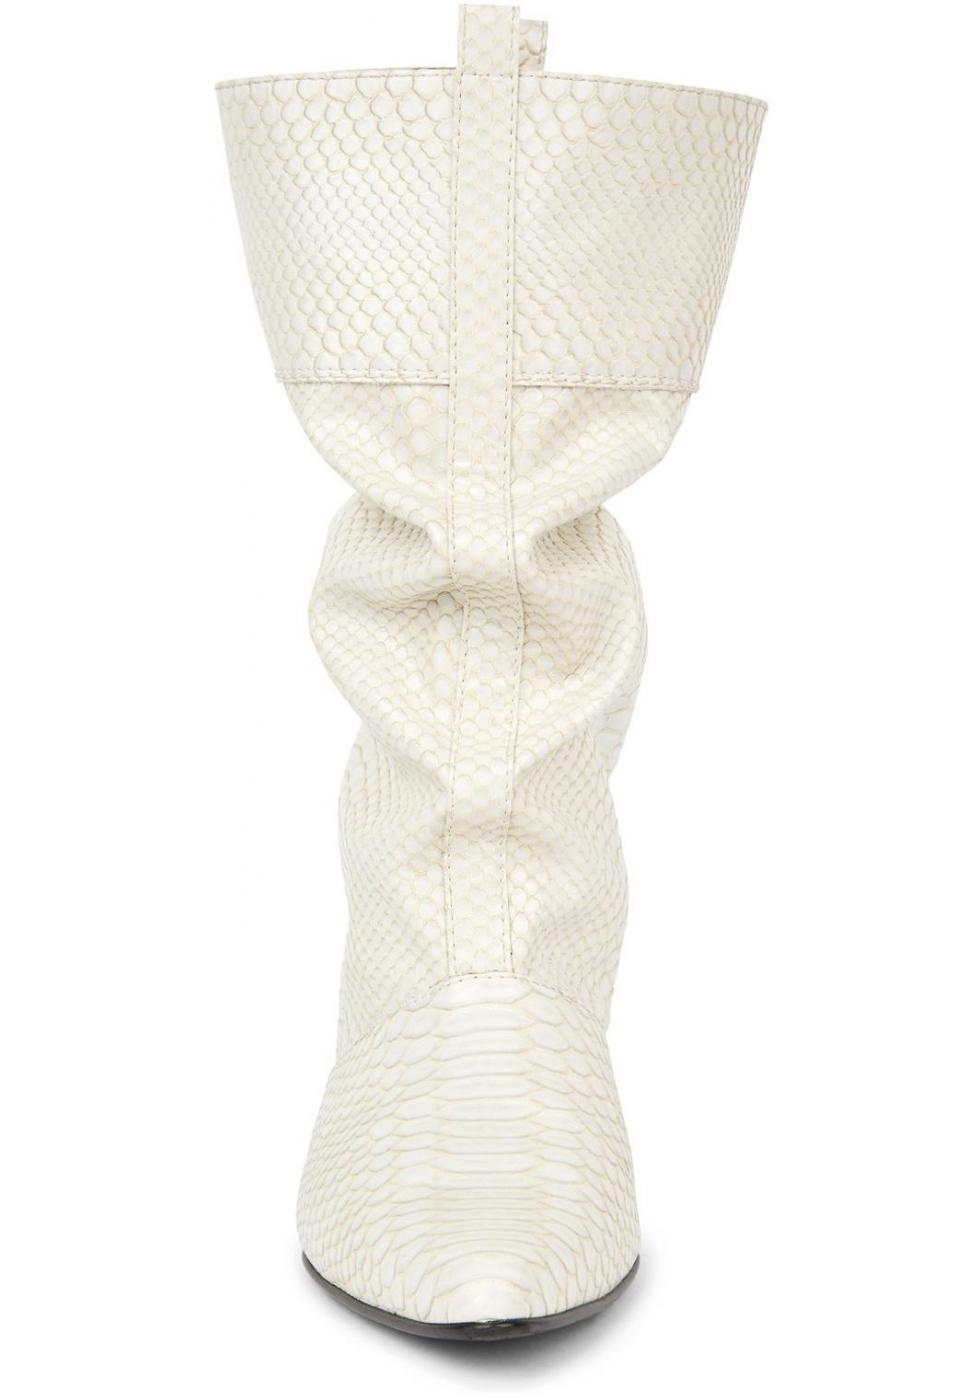 Bottines Stella McCartney en vegan python emprimée - Italian Boutique 6f8b86126d21